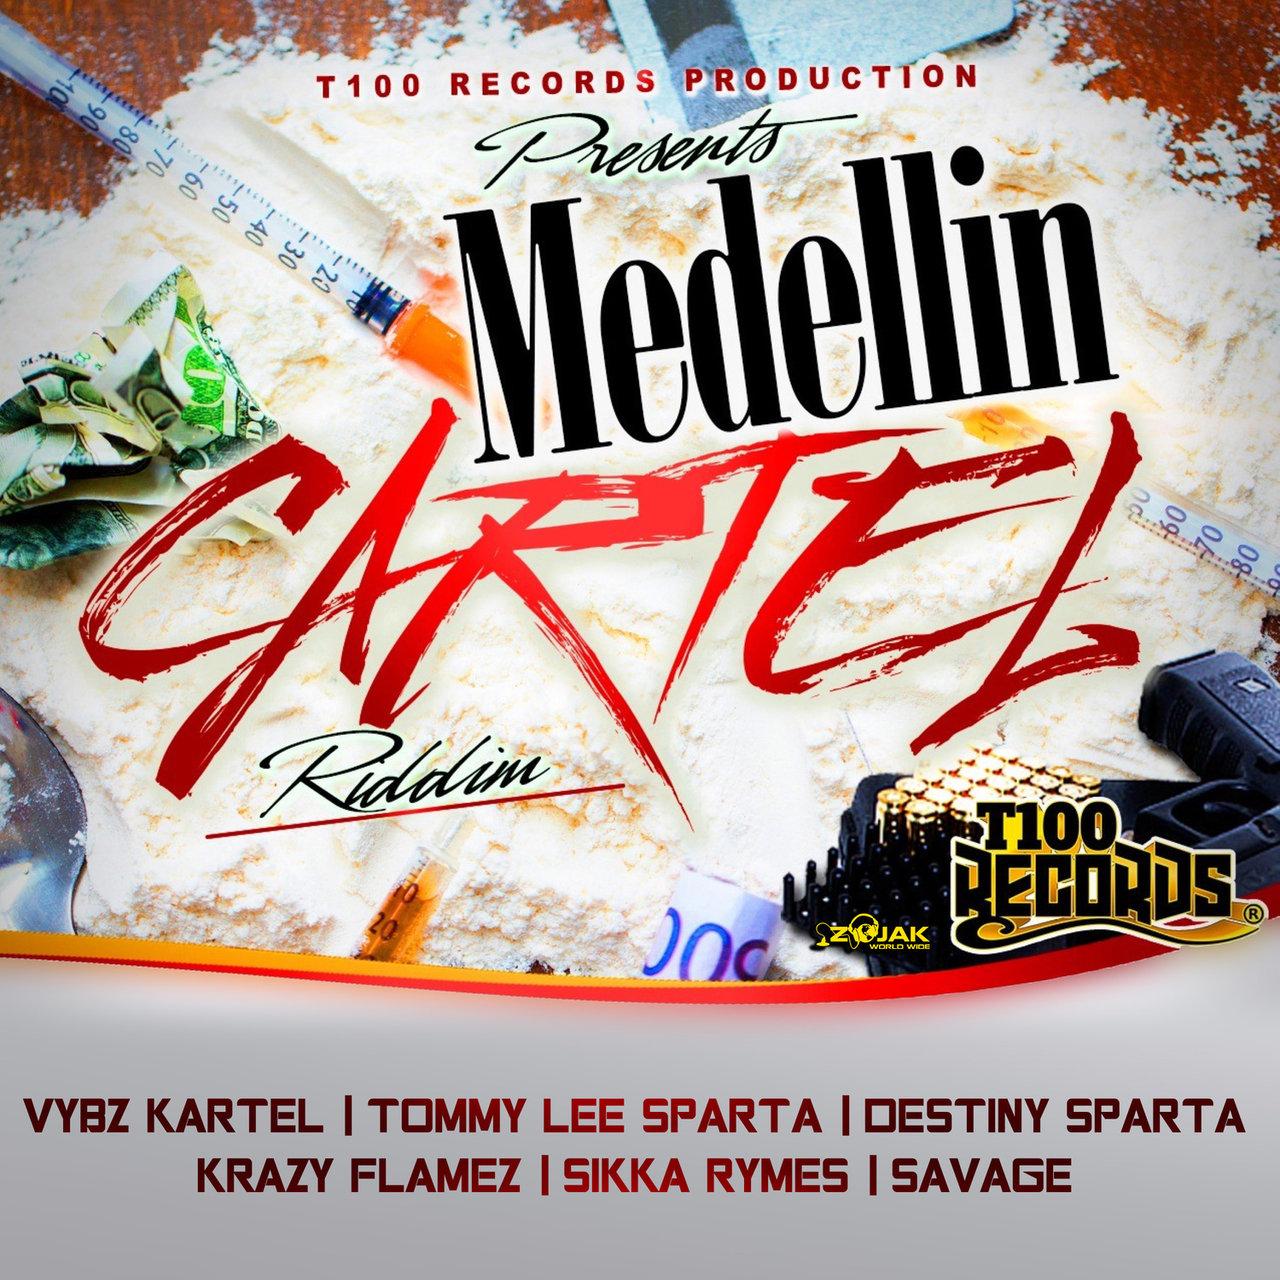 Medellin Cartel Riddim (Cover)